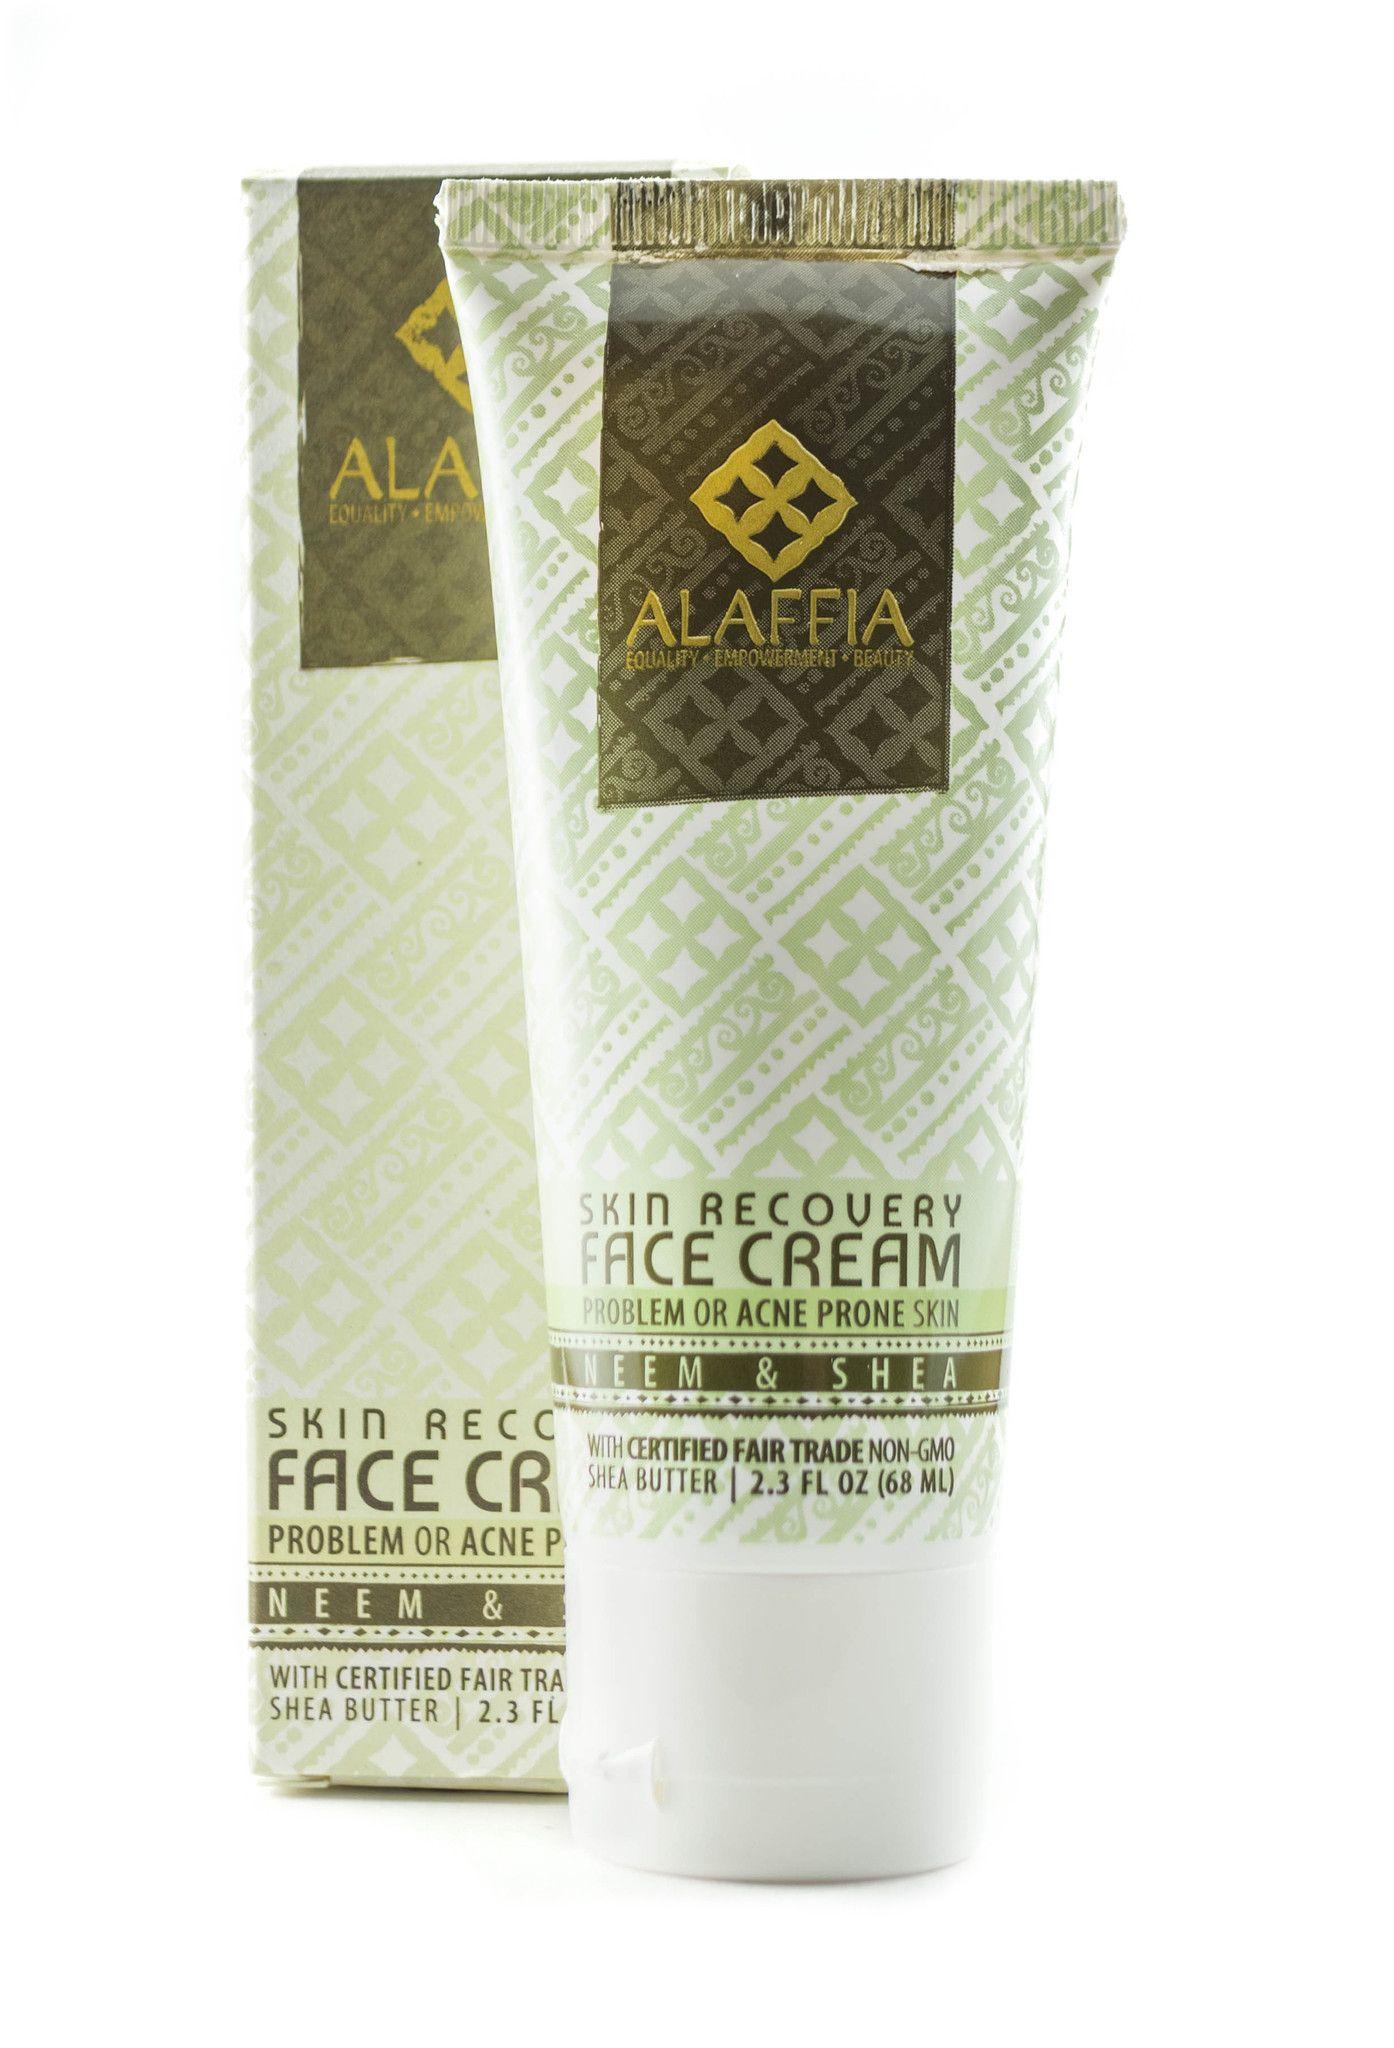 Skin Recovery Face Cream Face cream, Skin, Cream